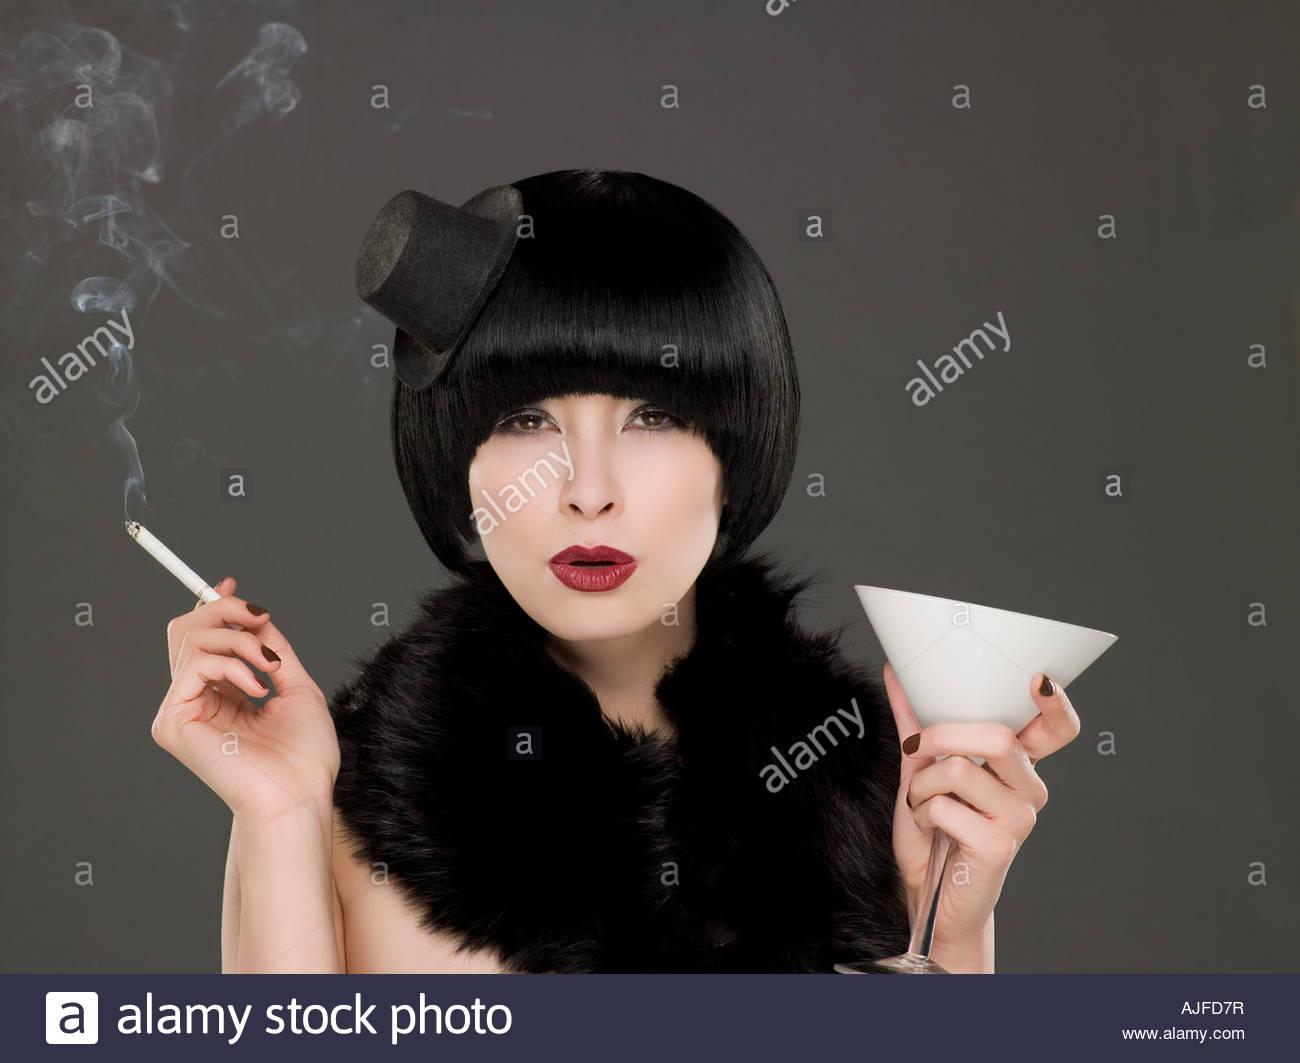 Woman smoking and drinking - Stock Image